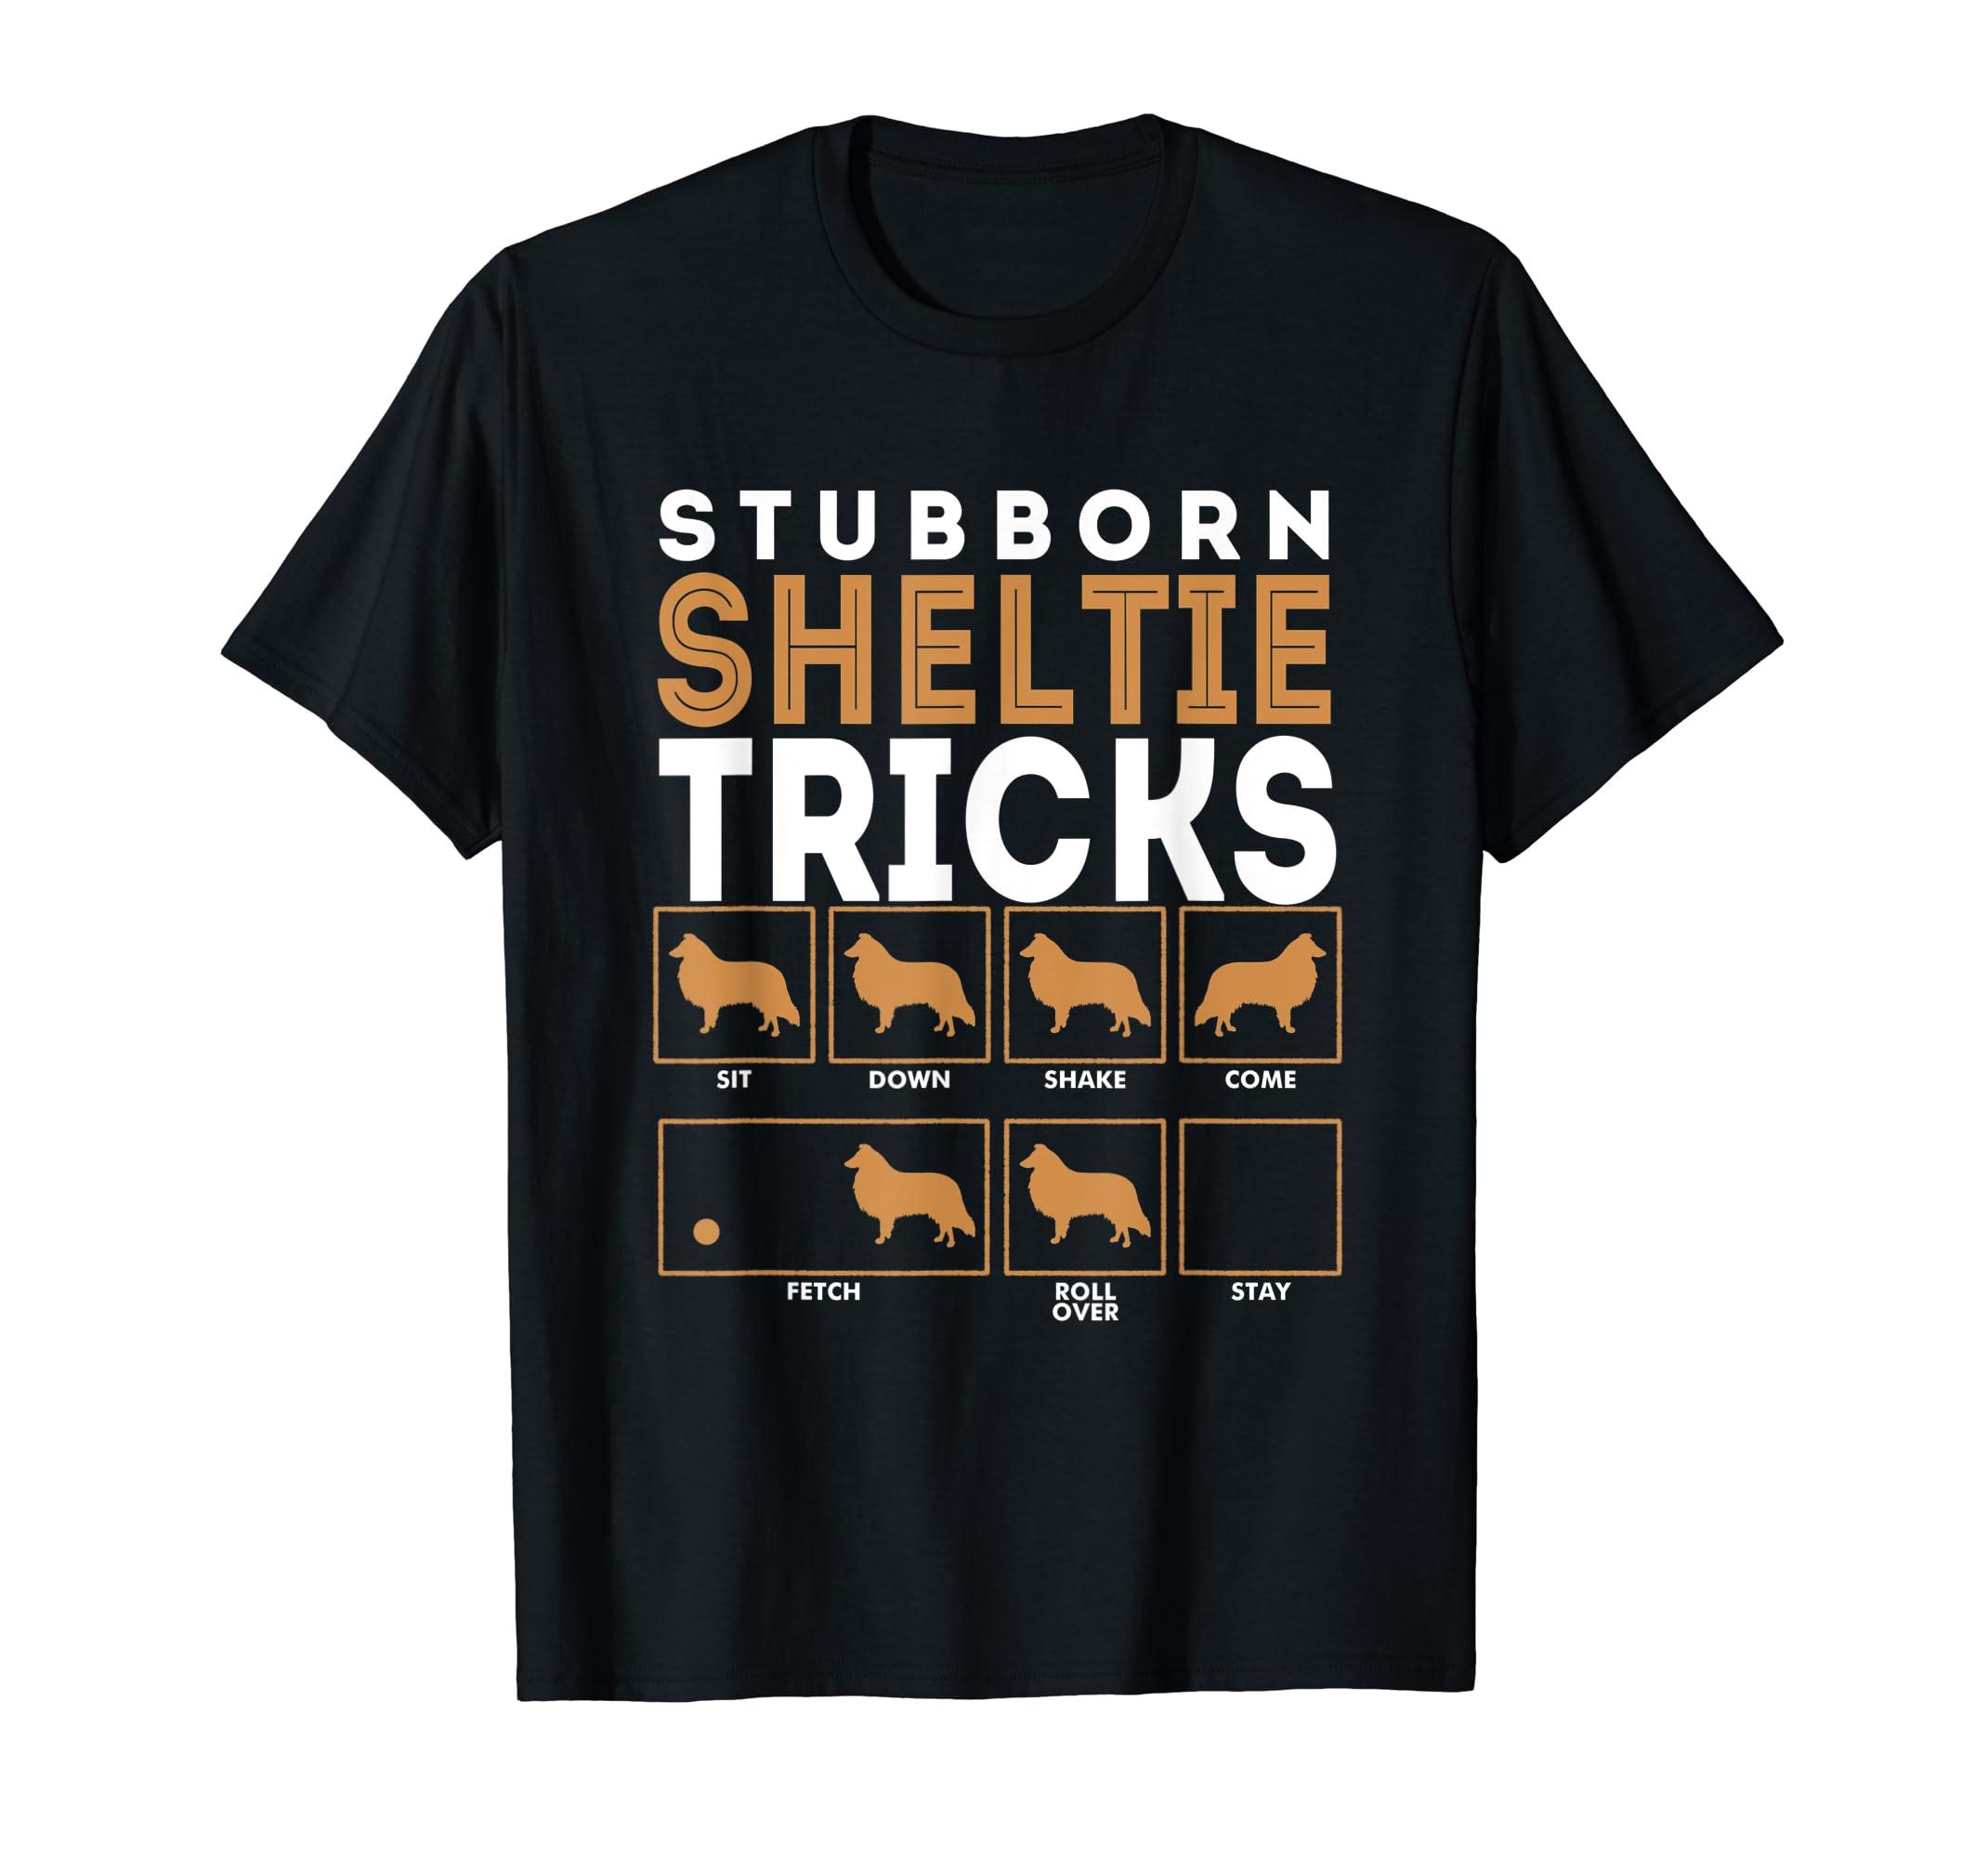 Stubborn Shetland Sheepdog Sheltie Dog Tricks T-Shirt-Men's T-Shirt-Black